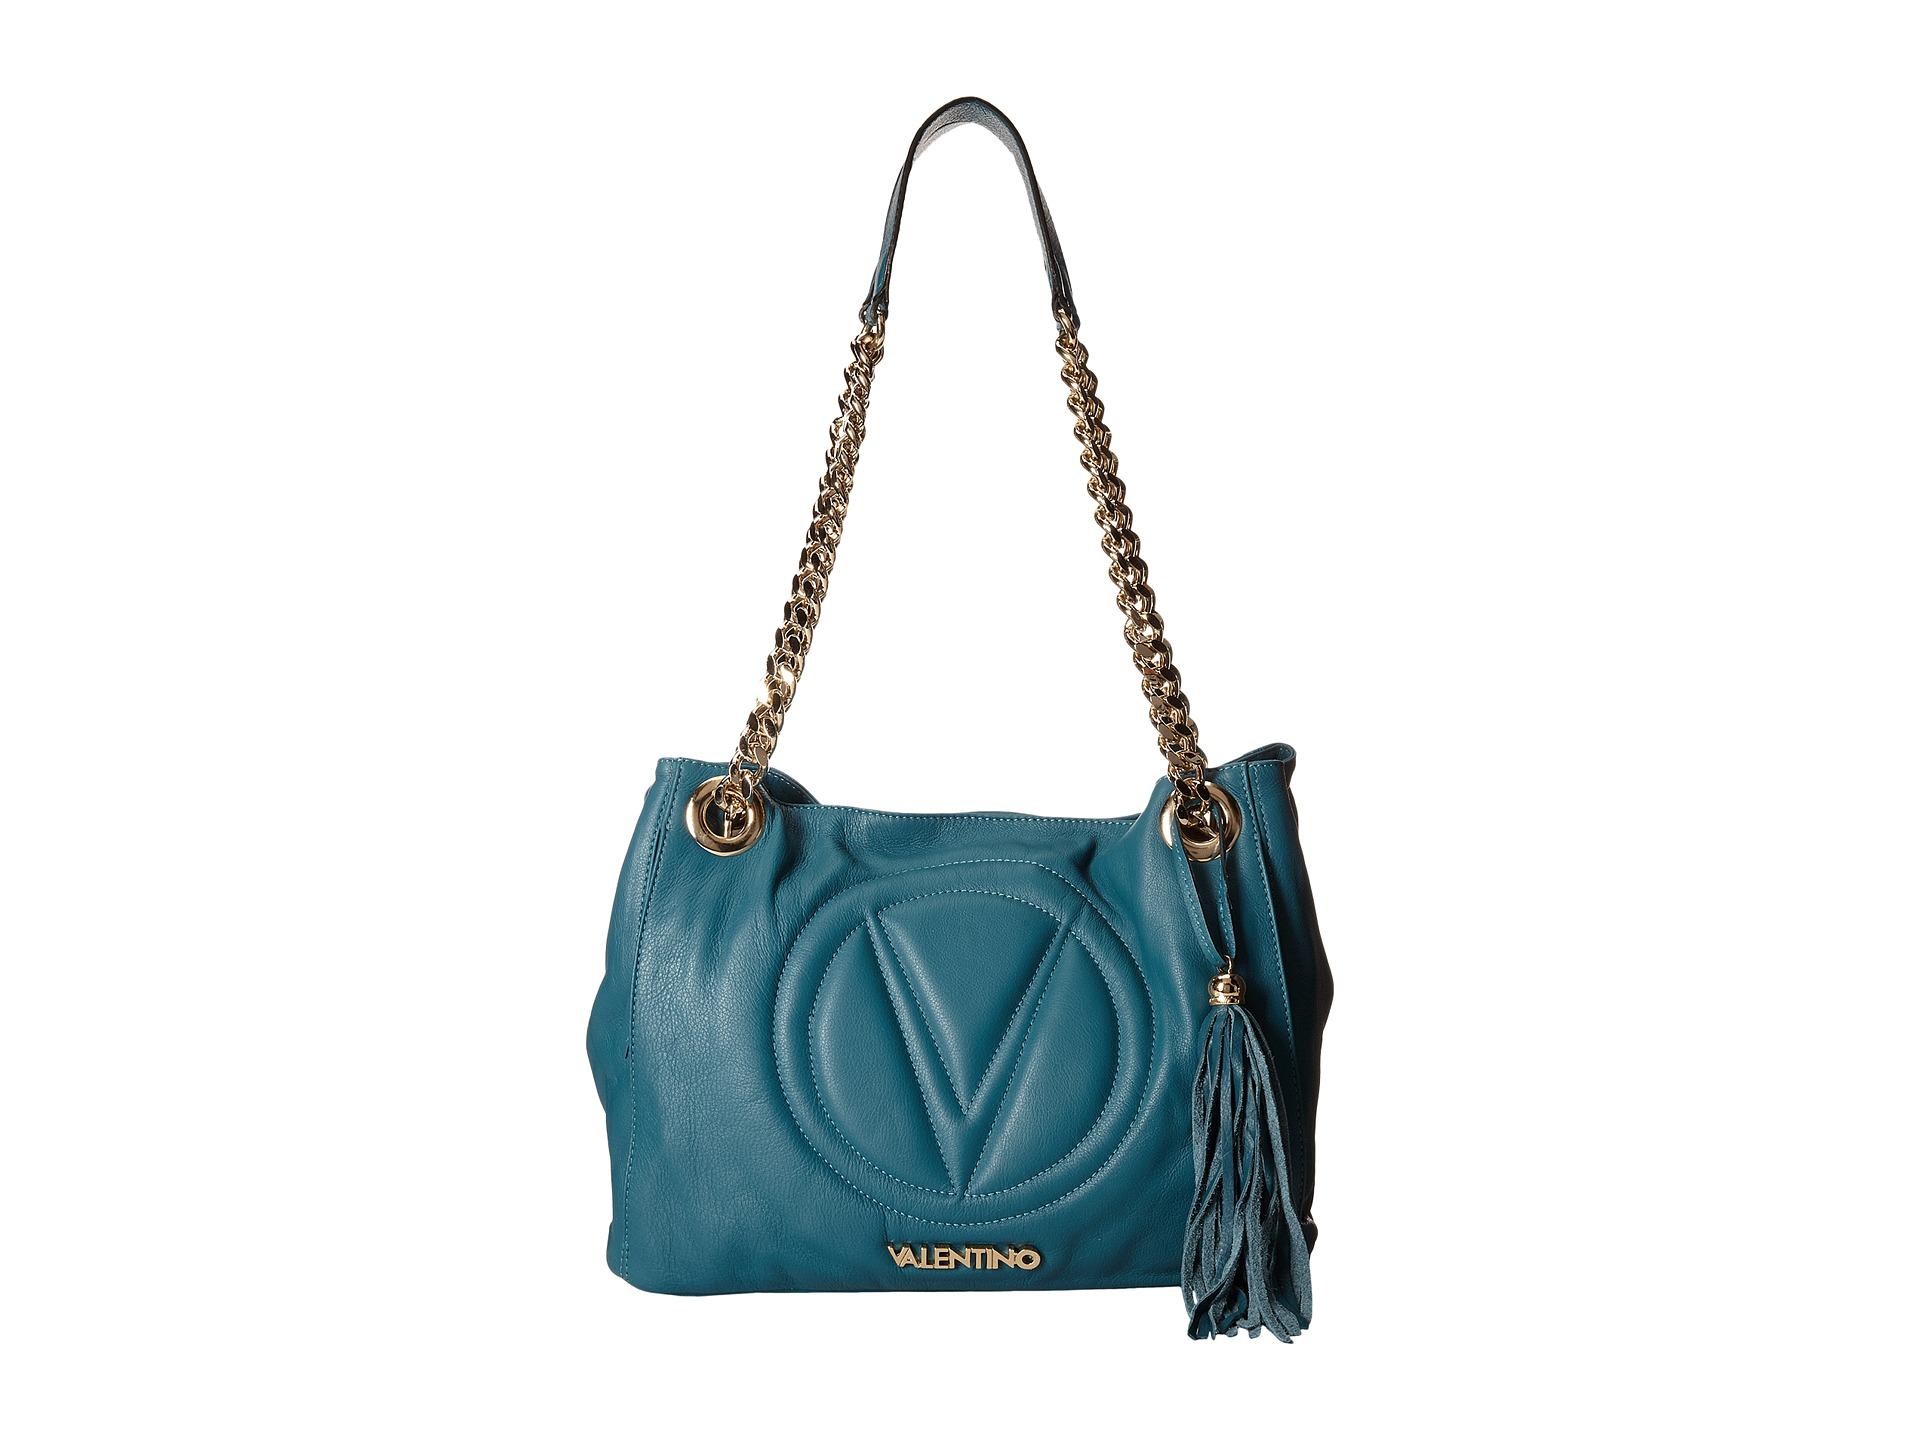 Valentino Bags by Mario Valentino Women's Luisa 2的圖片搜尋結果